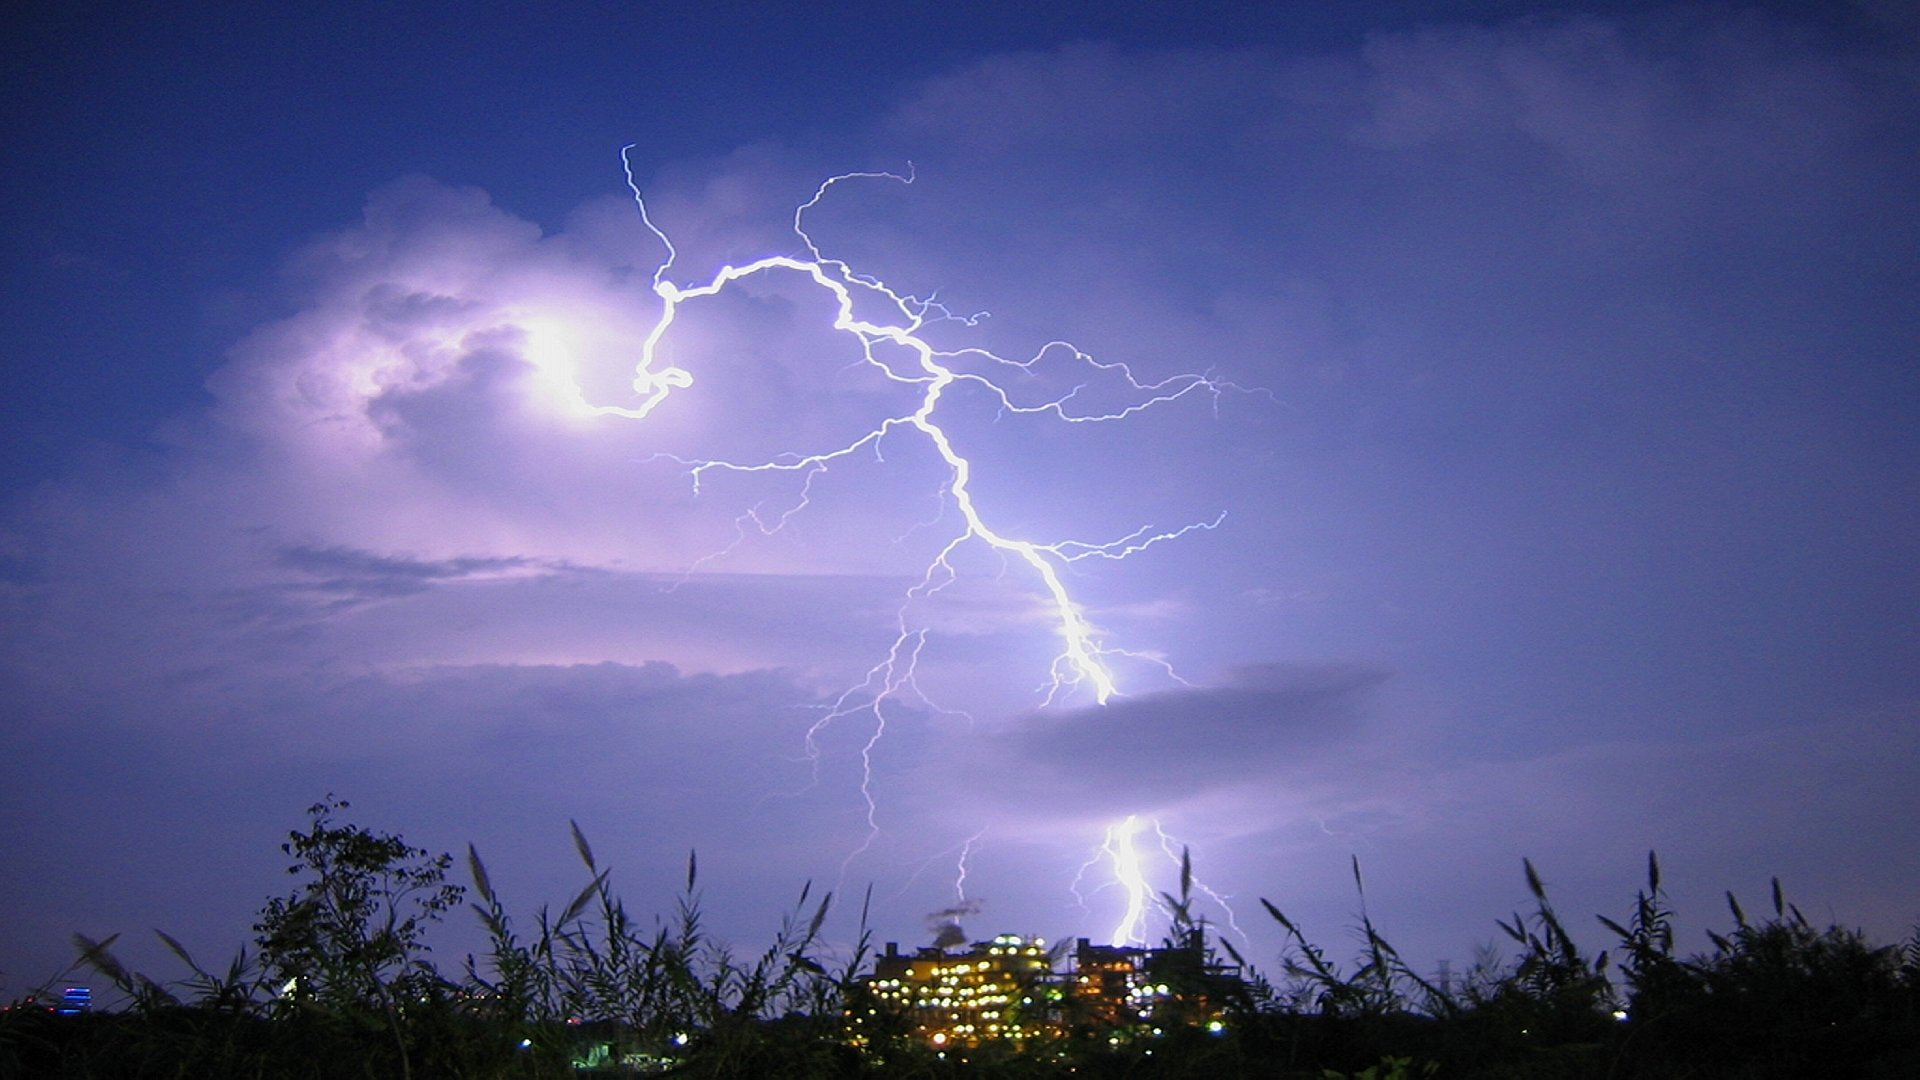 lightning hd wallpaper  background image  1920x1080  id